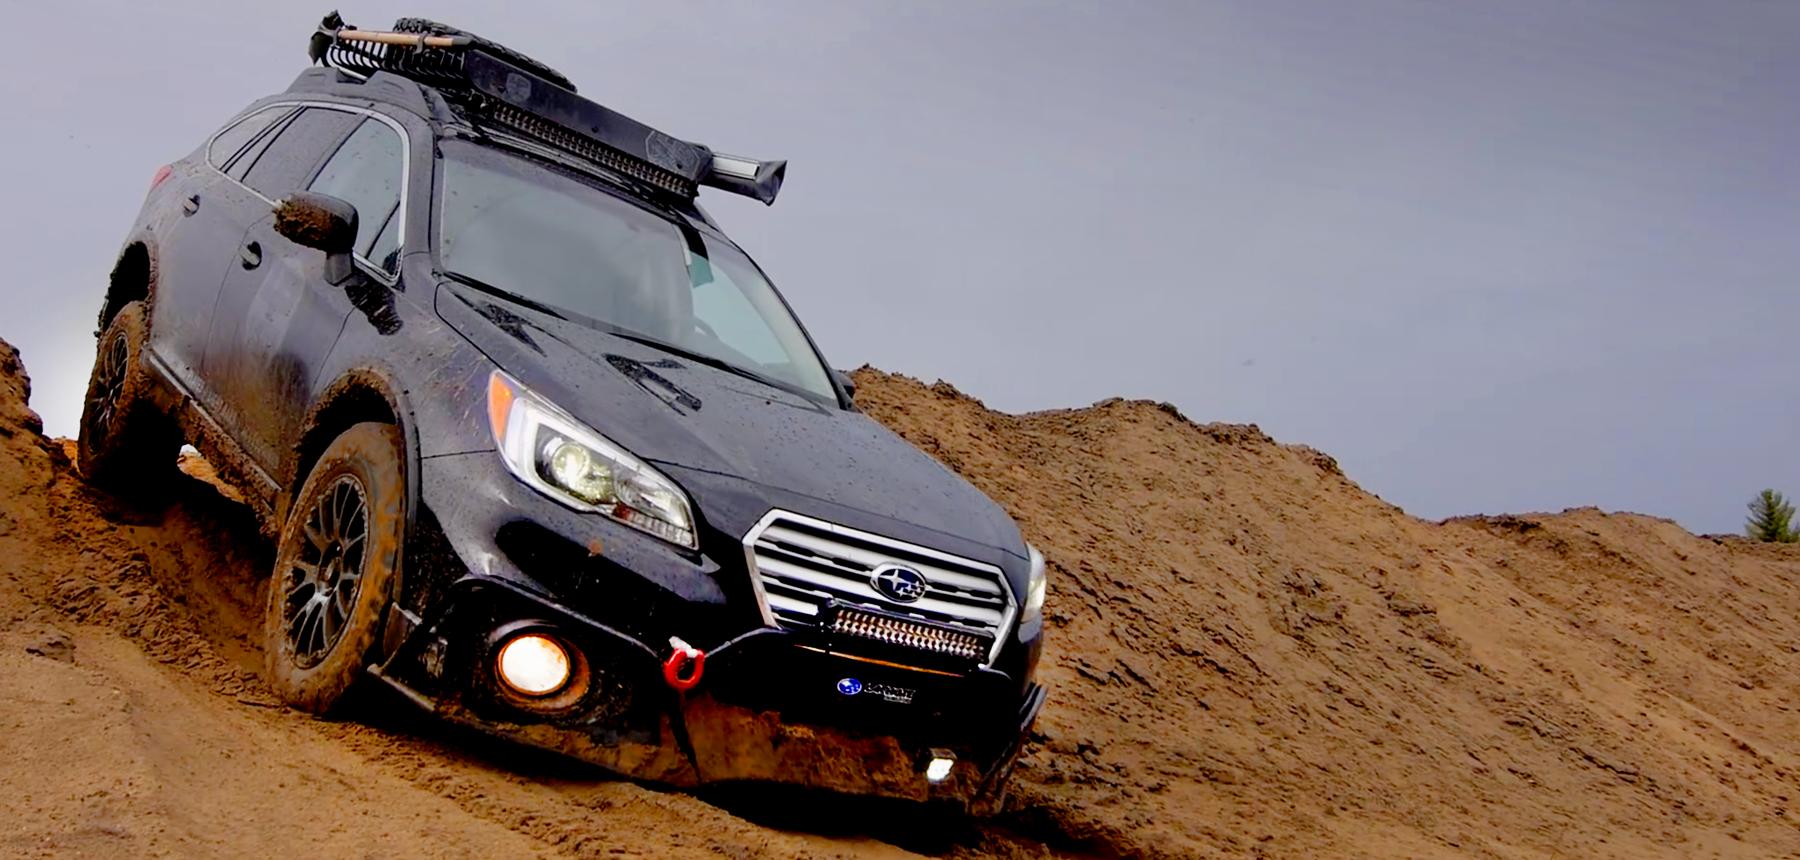 Subaru Suspension Lift Kits Autoplex Northglenn Loveland Longmont Co